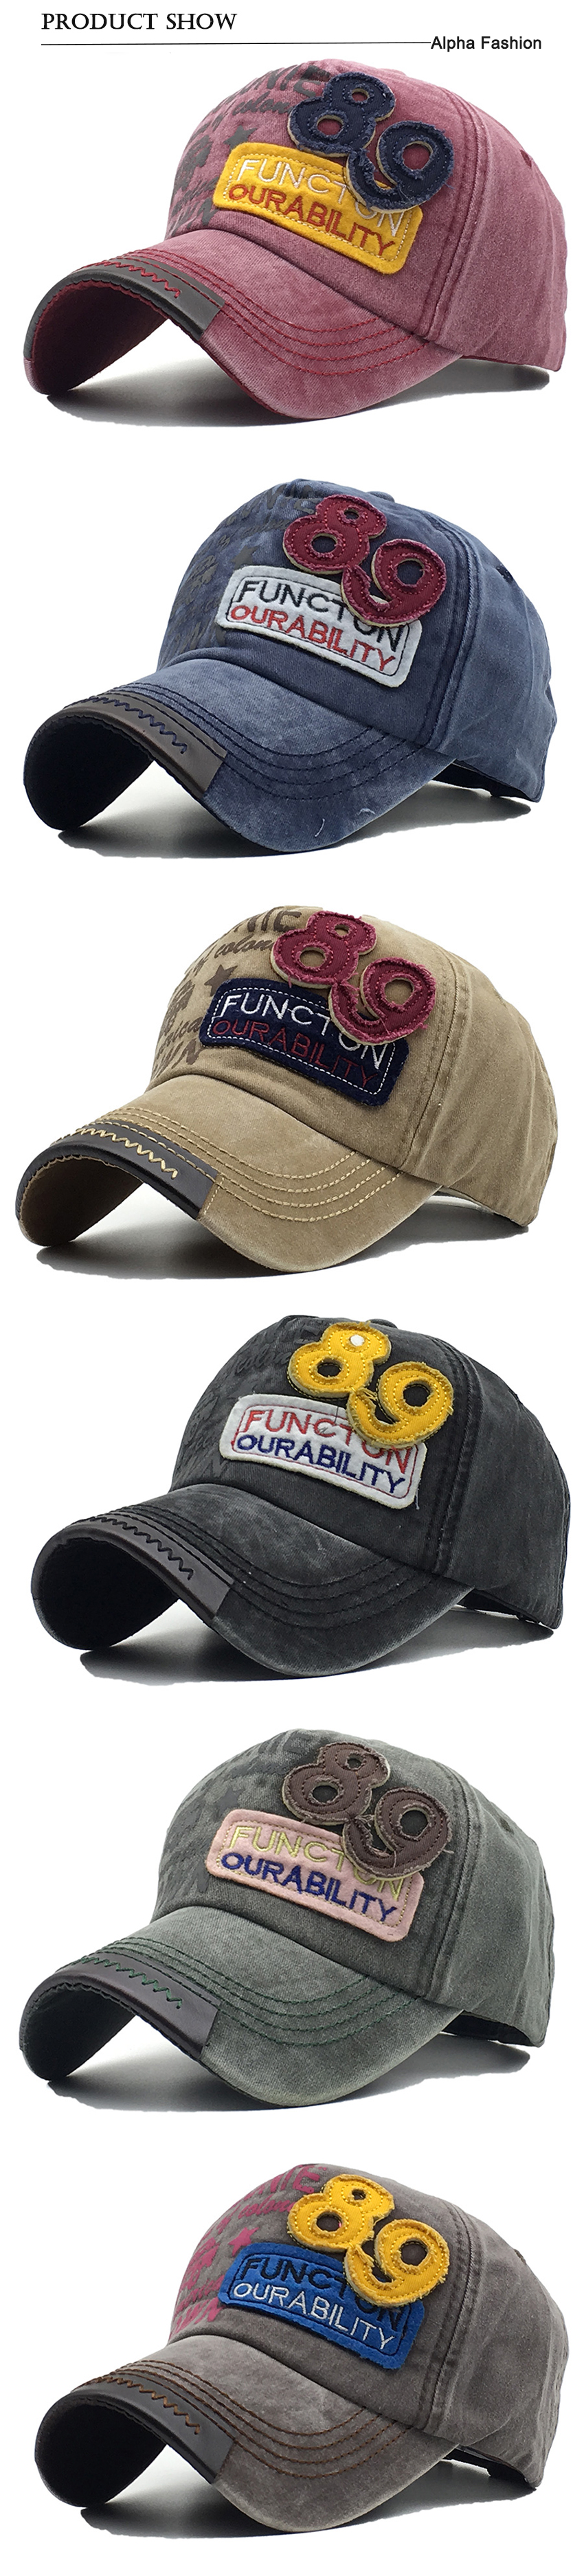 ᐃAlfa moda nuevo estilo 2018 algodón lavado gorra de béisbol ... 98d46d001af